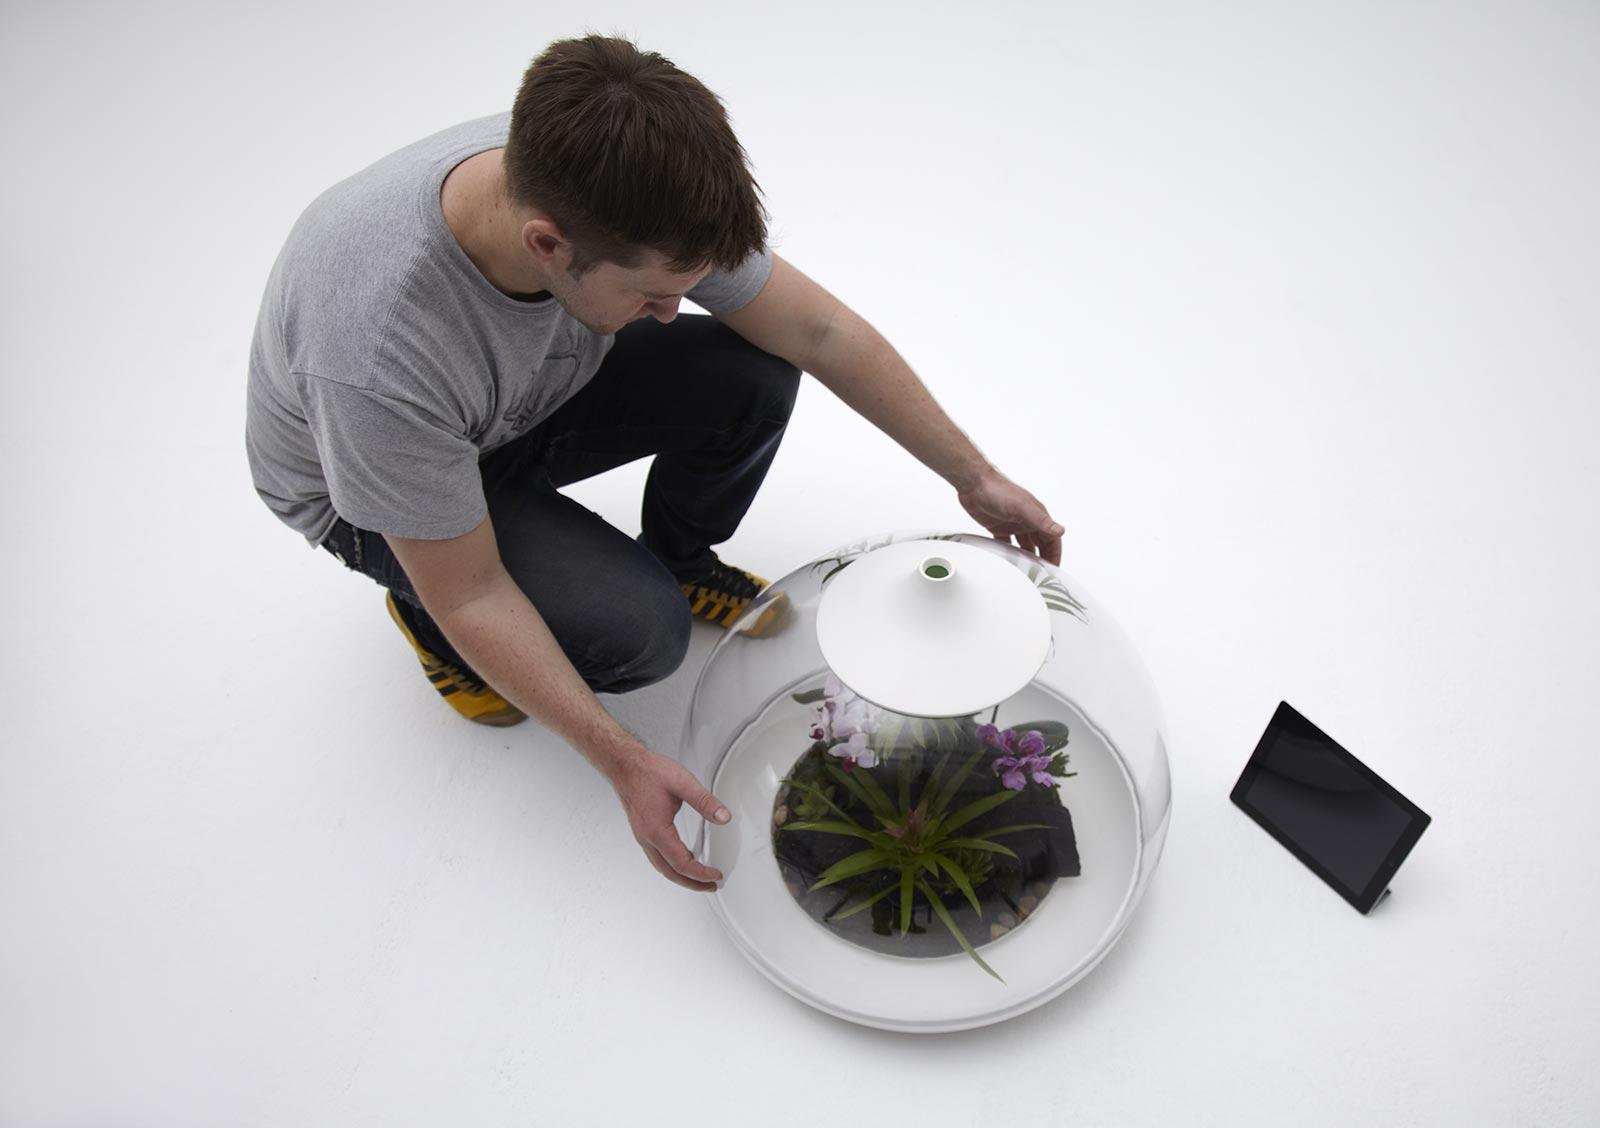 Biome5 Samuelwilkinson - Biome Flora Terrarium - De Tamagotchi voor volwassenen